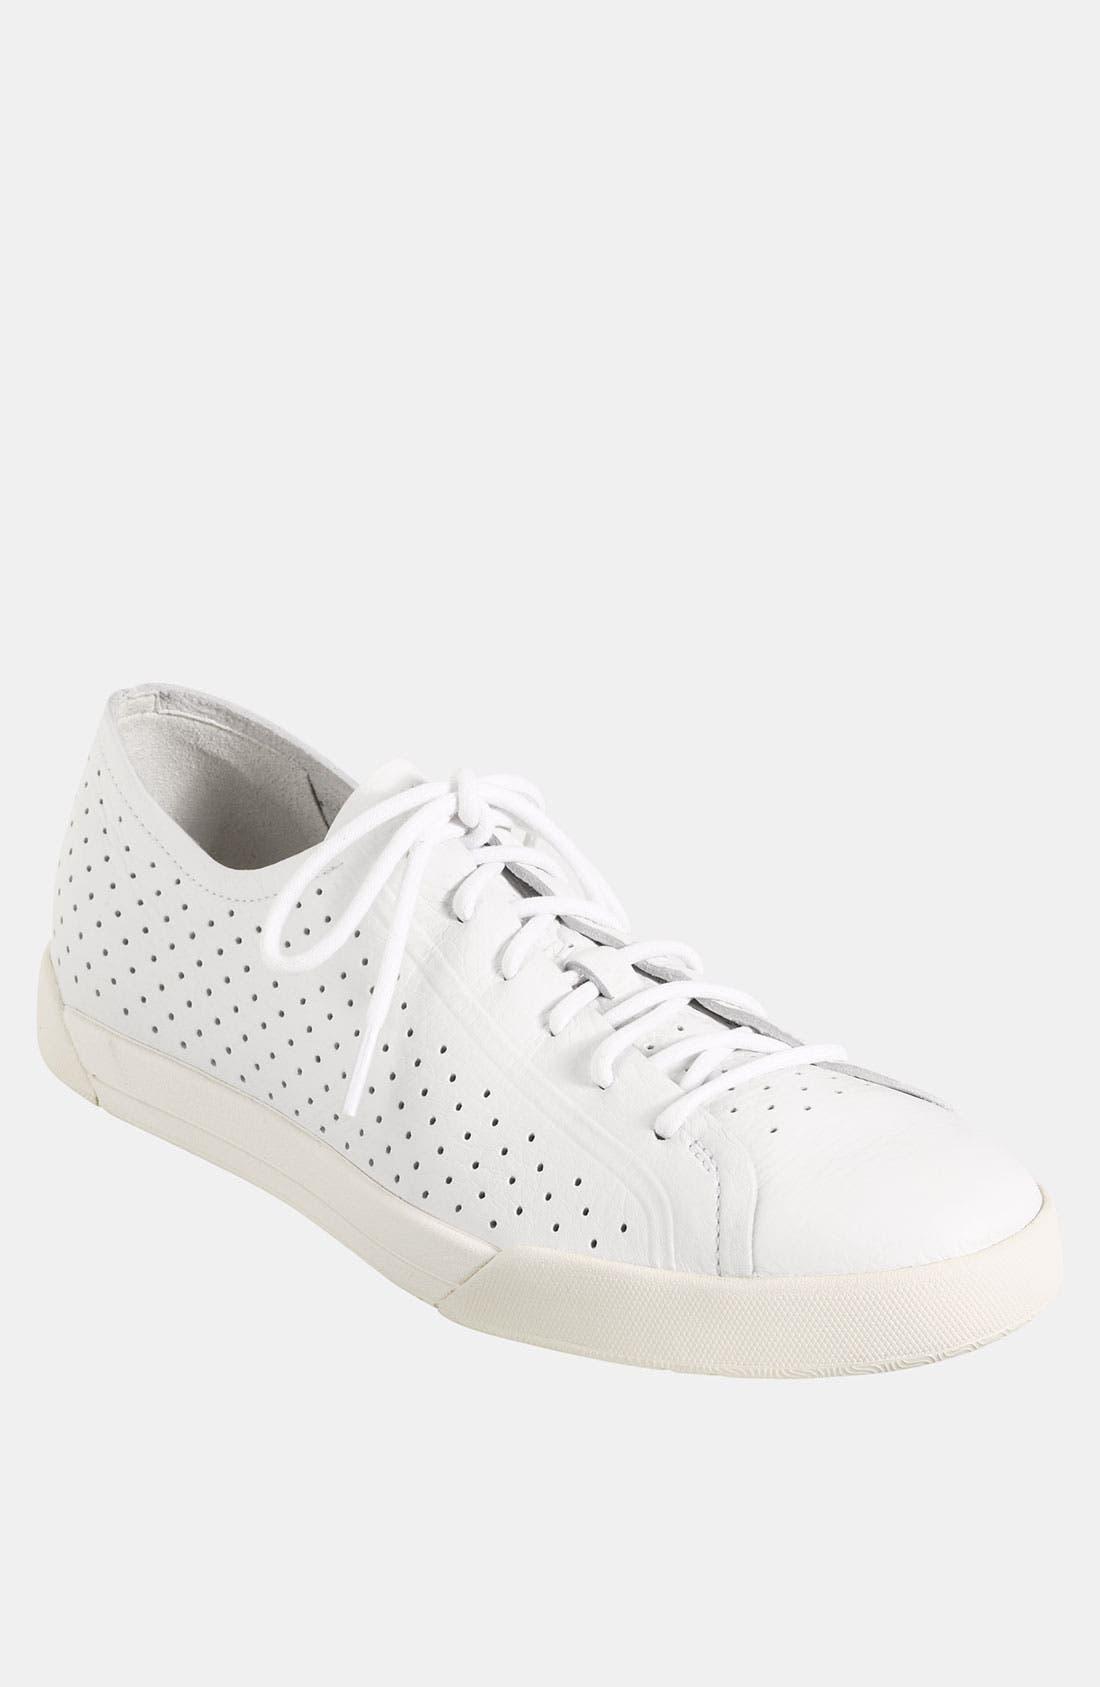 Main Image - Cole Haan 'Air Jasper' Sneaker